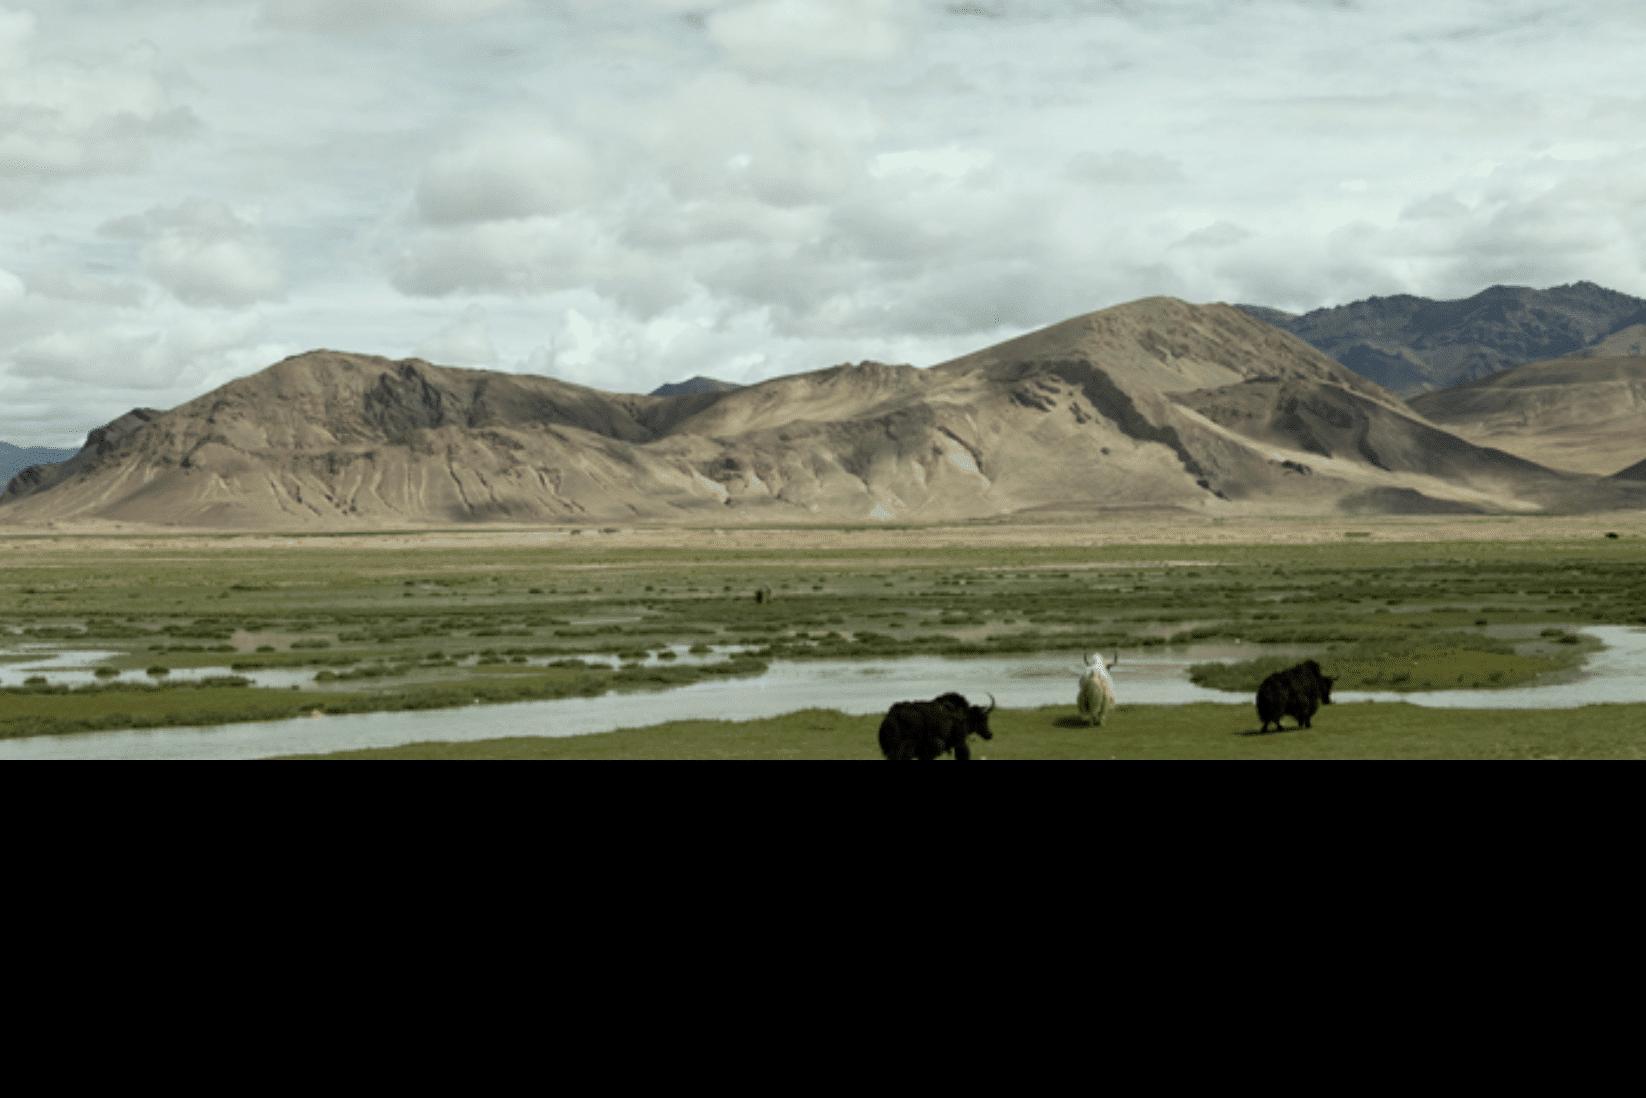 Tibet Yaks Land